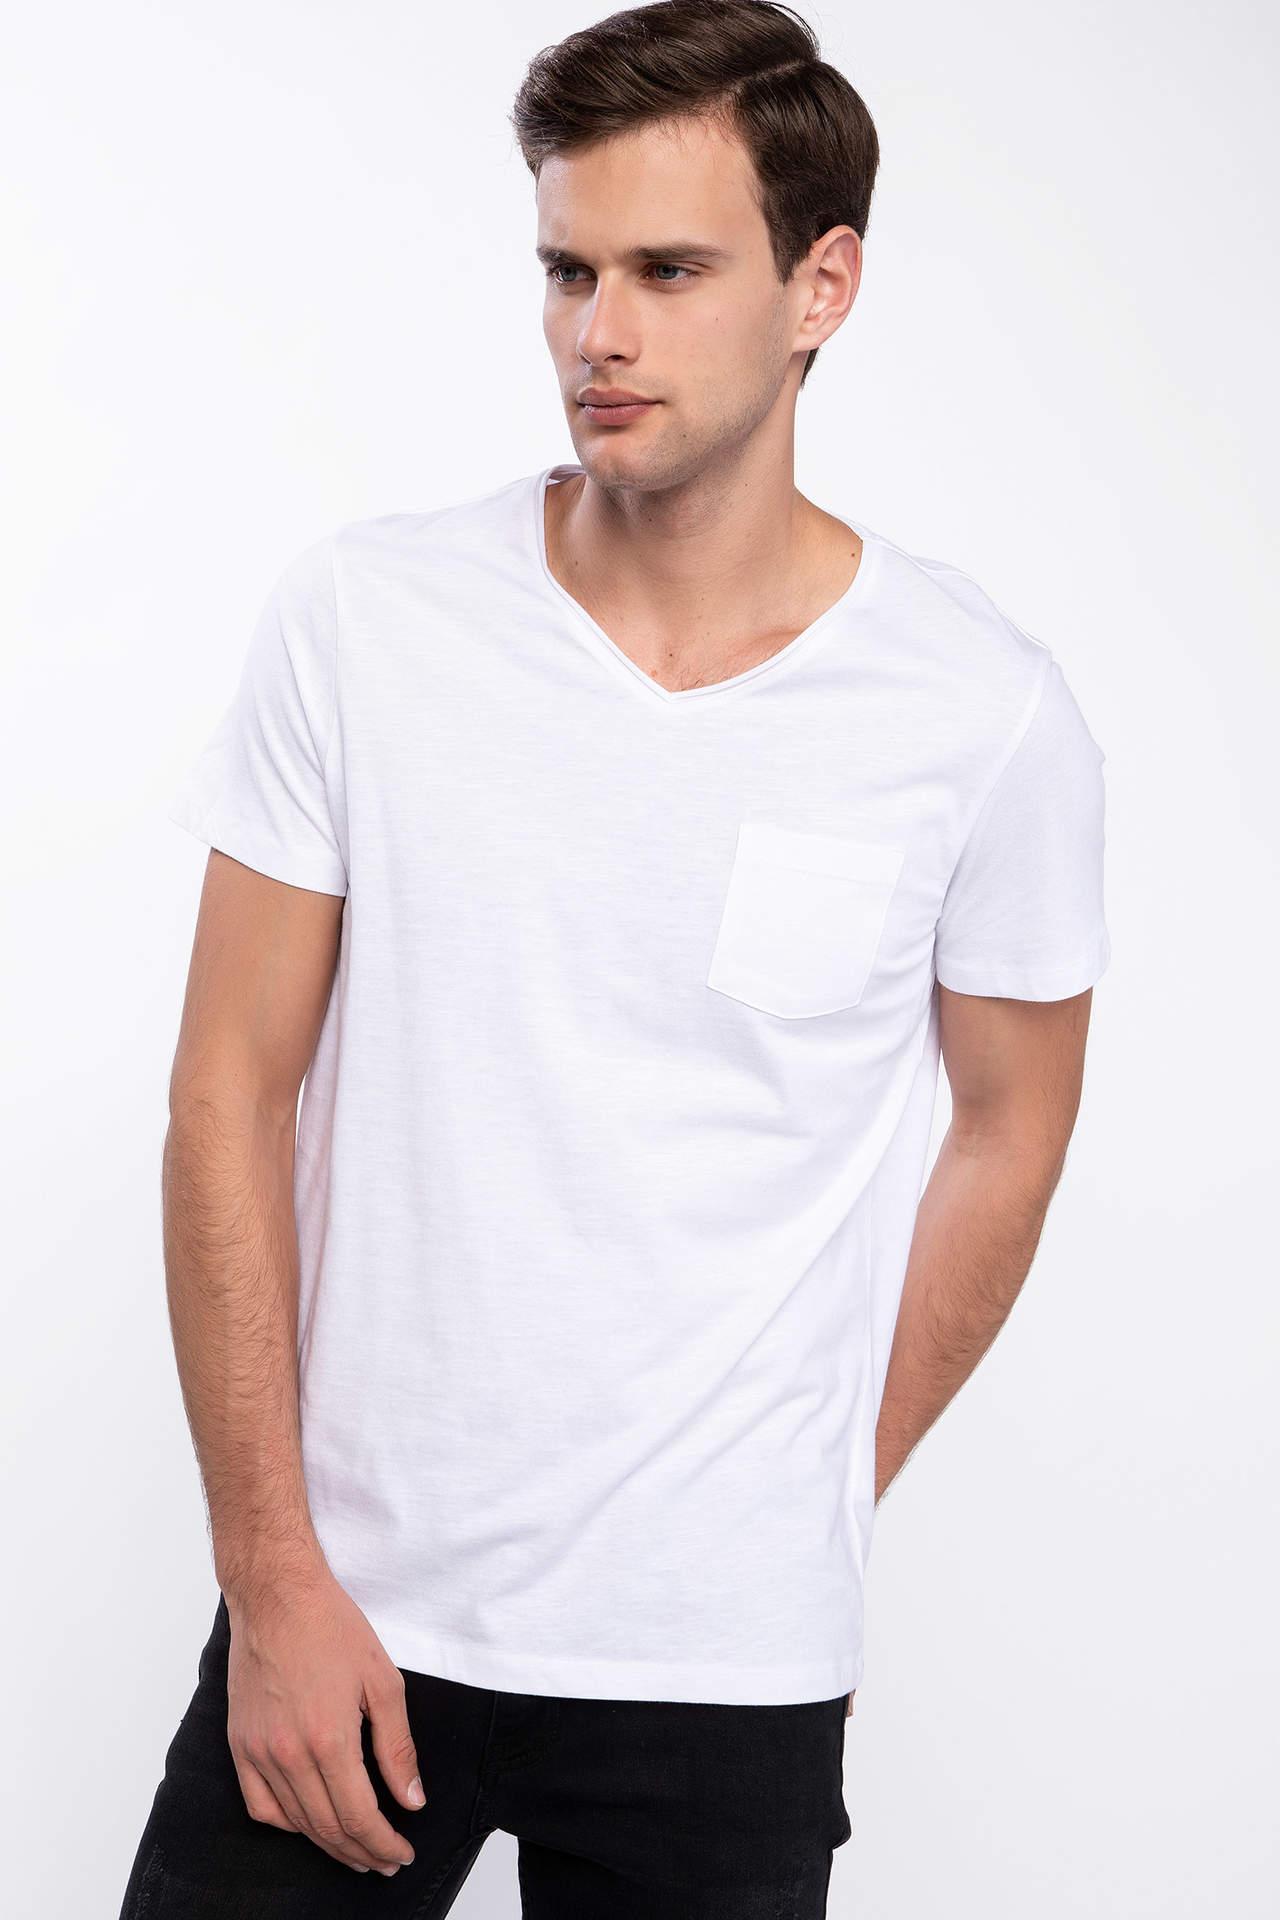 DeFacto Erkek Tek Cepli V Yaka Slim Fit T-shirt Beyaz male